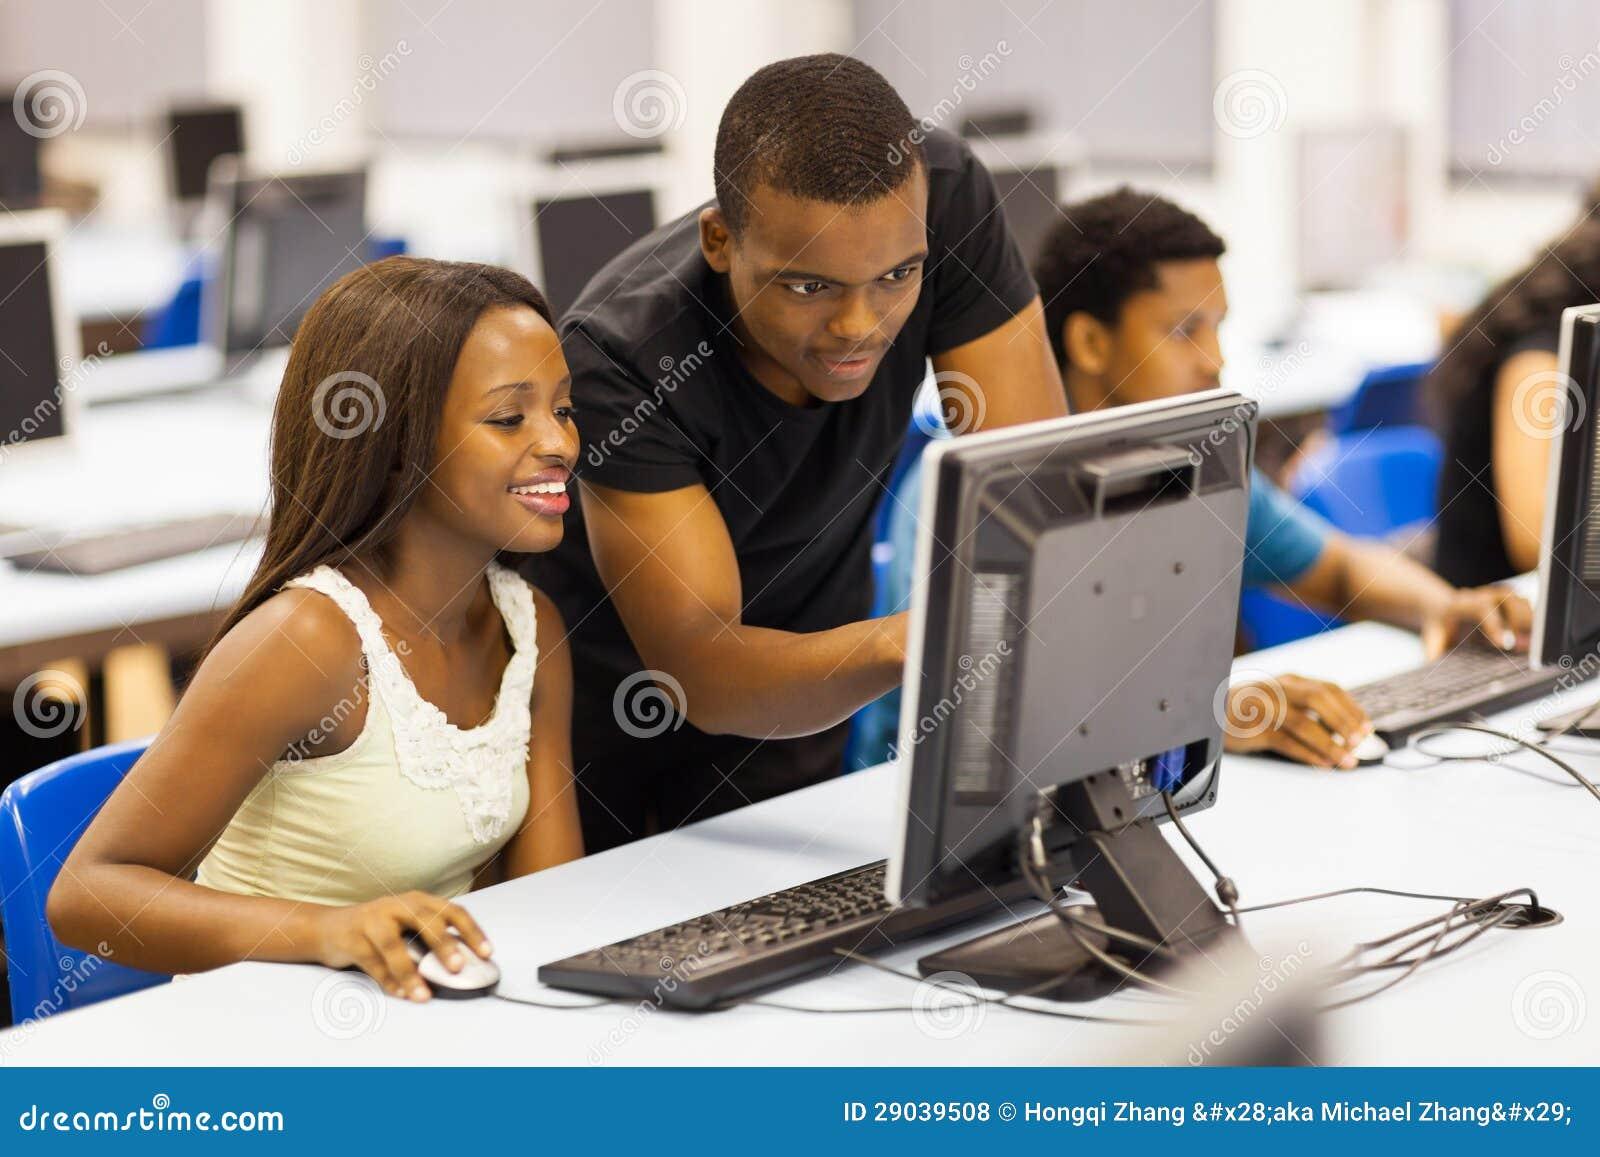 Corporate university business plan